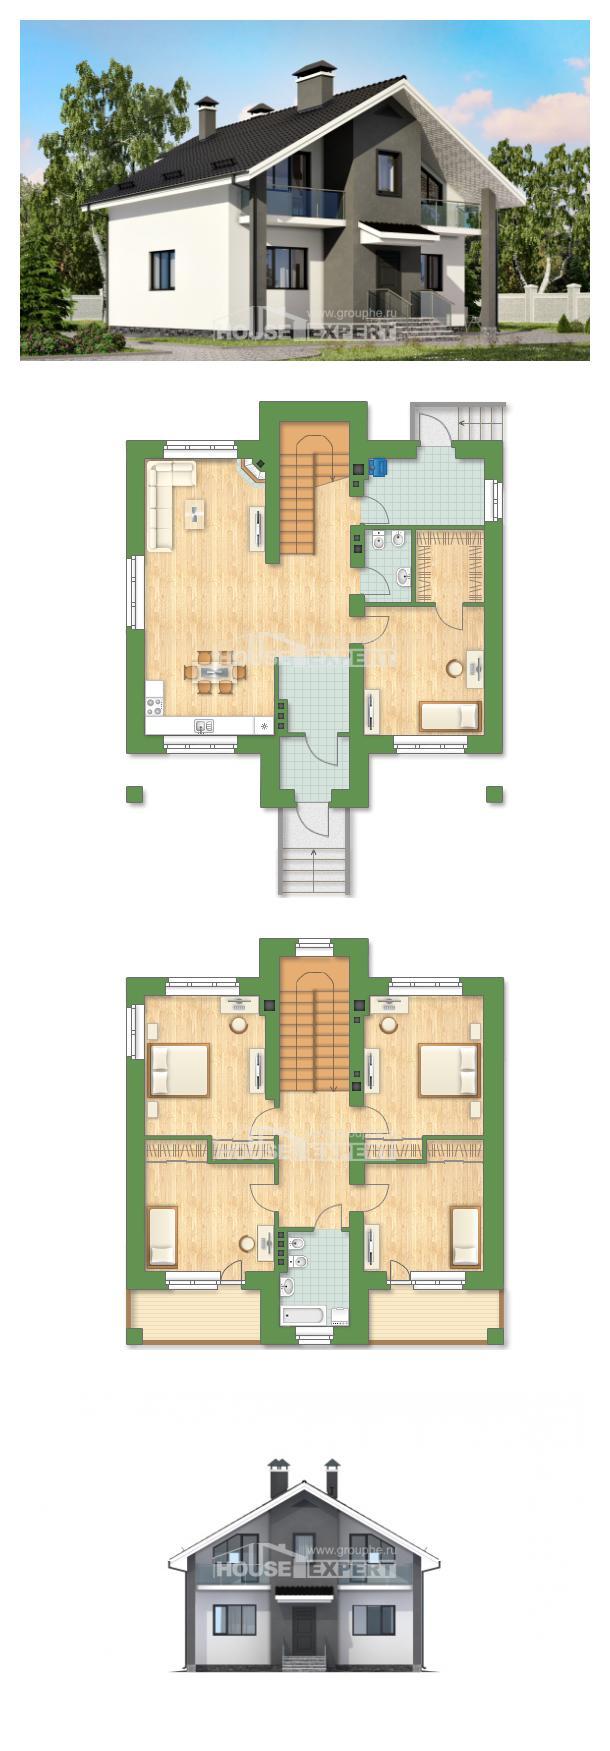 Proyecto de casa 150-005-L | House Expert